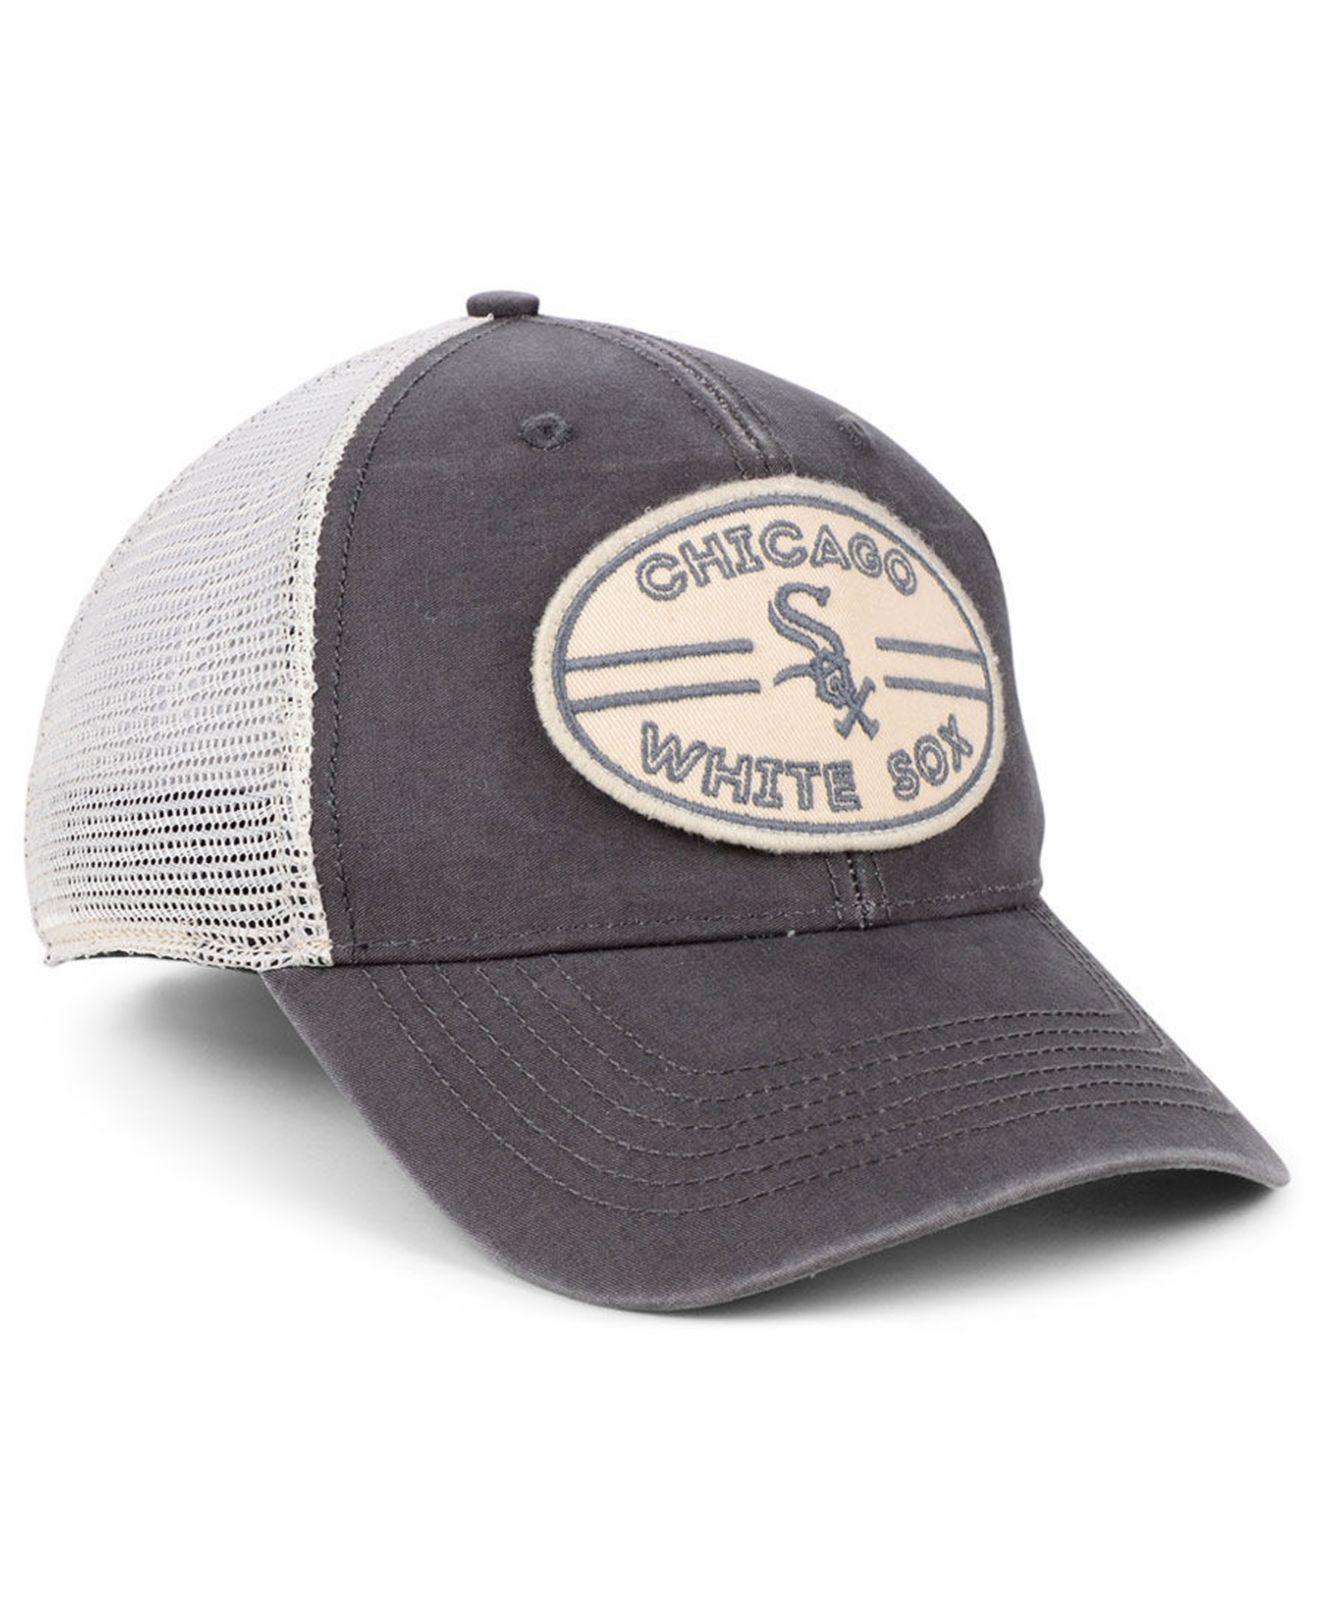 size 40 89852 52018 Lyst - 47 Brand Chicago White Sox Hudson Patch Trucker Mvp Cap in Gray for  Men